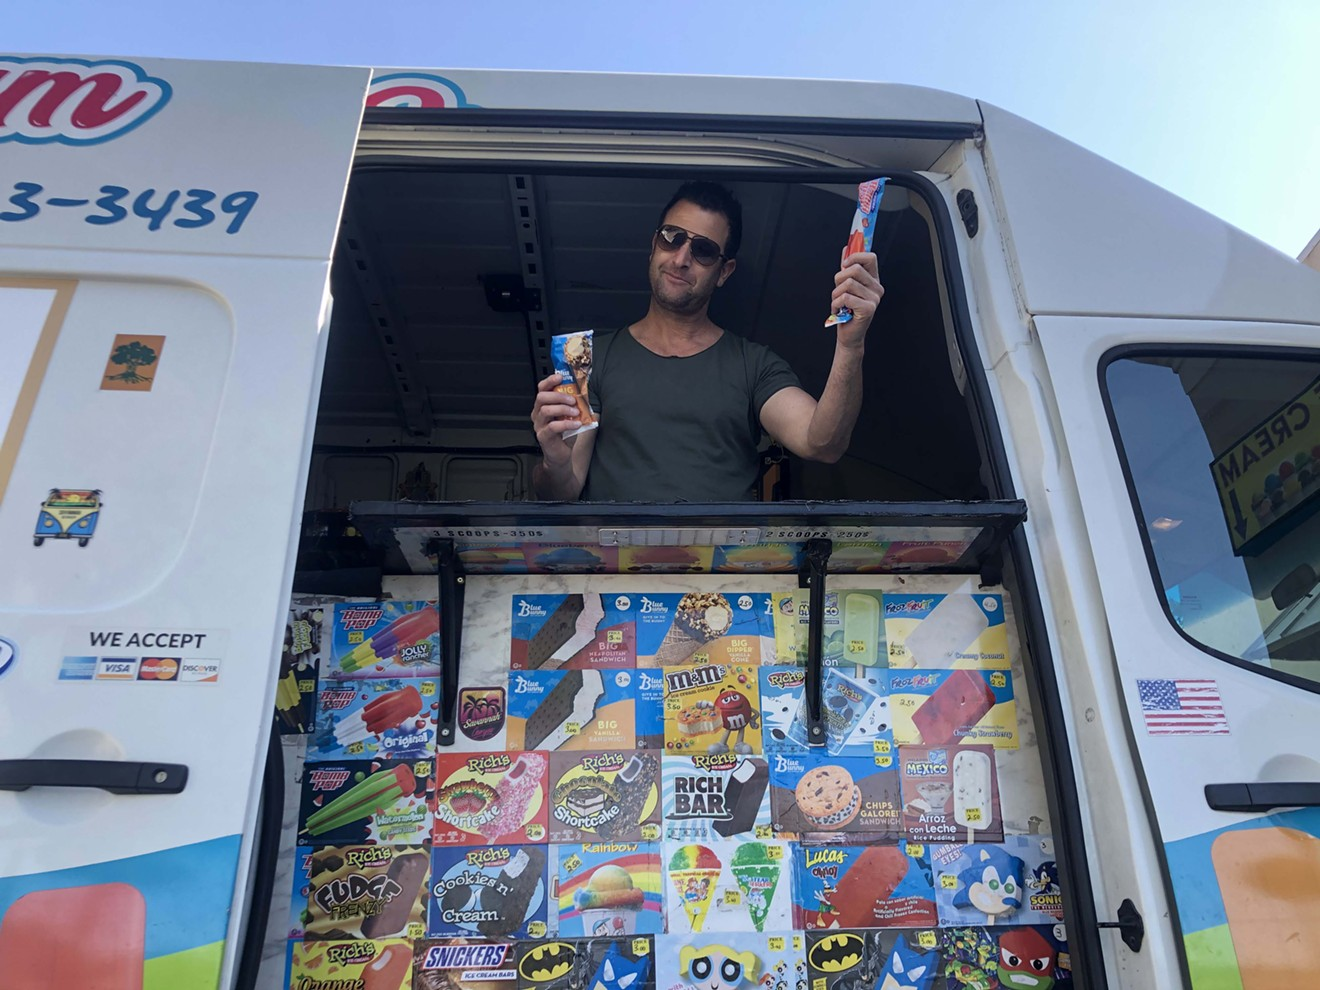 Dotan Organ sells ice cream out of his mobile Toti Ice Cream truck.